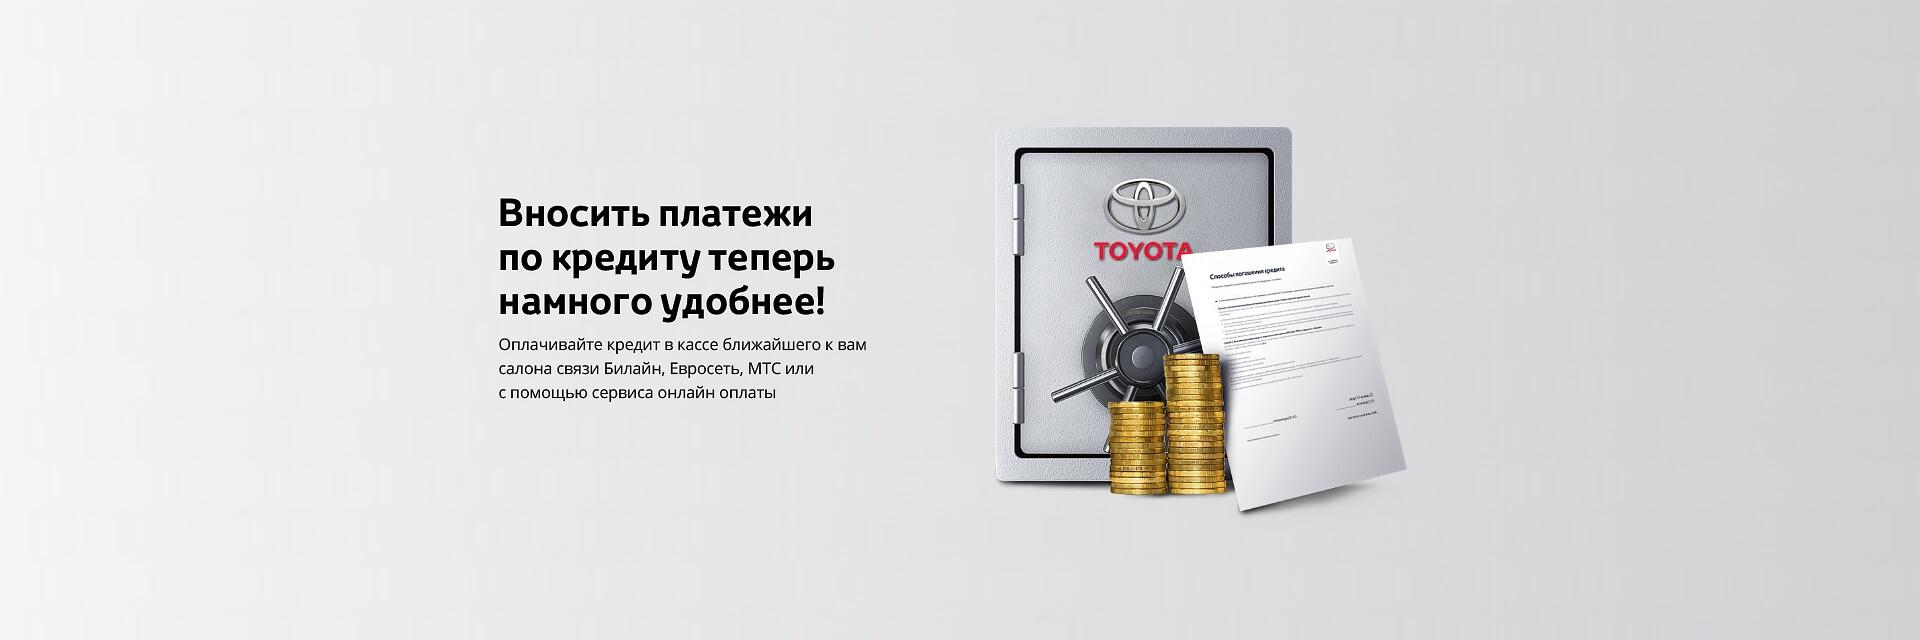 кредит мтс спб адрес сбербанка москва вавилова 18